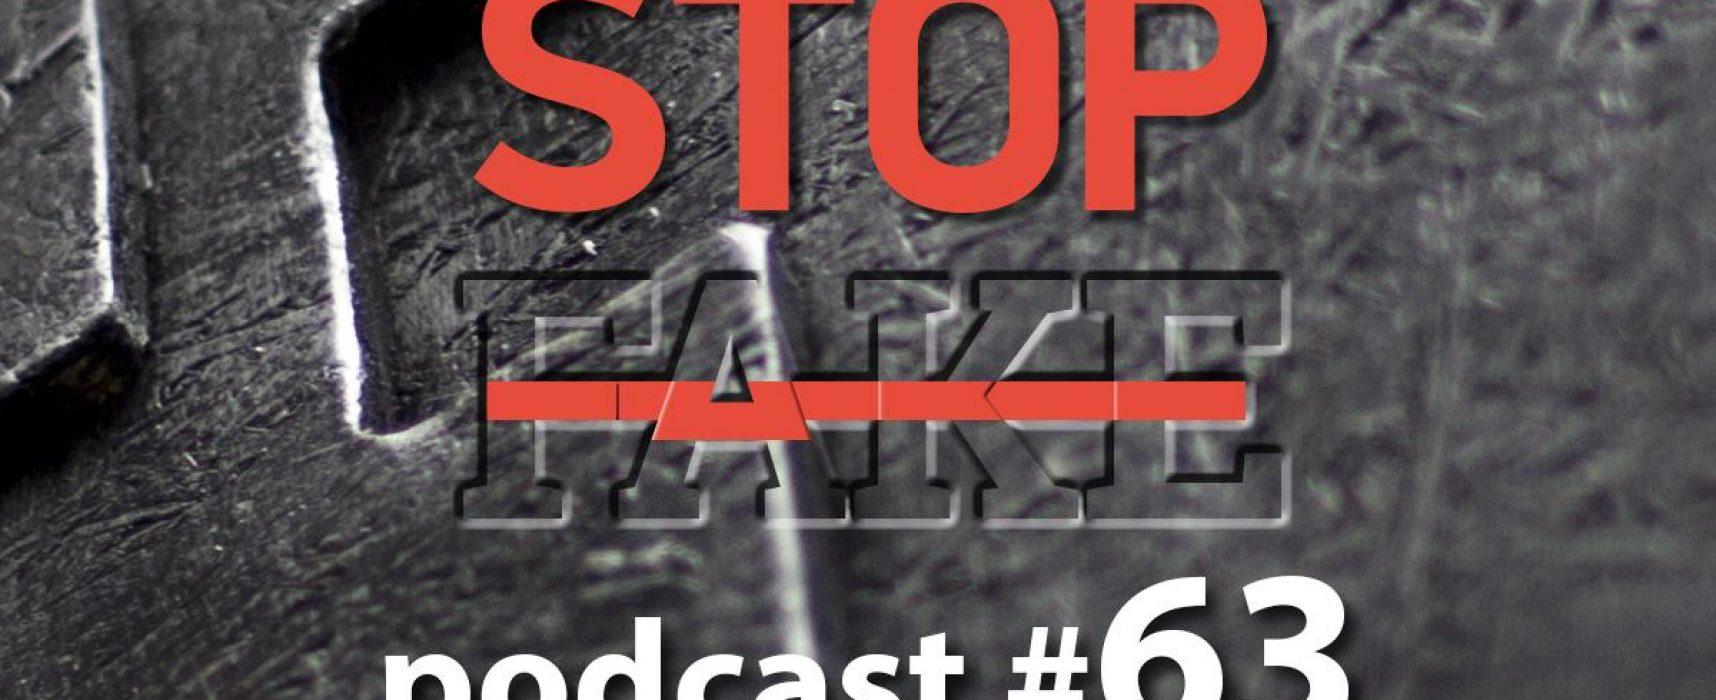 StopFake podcast #63